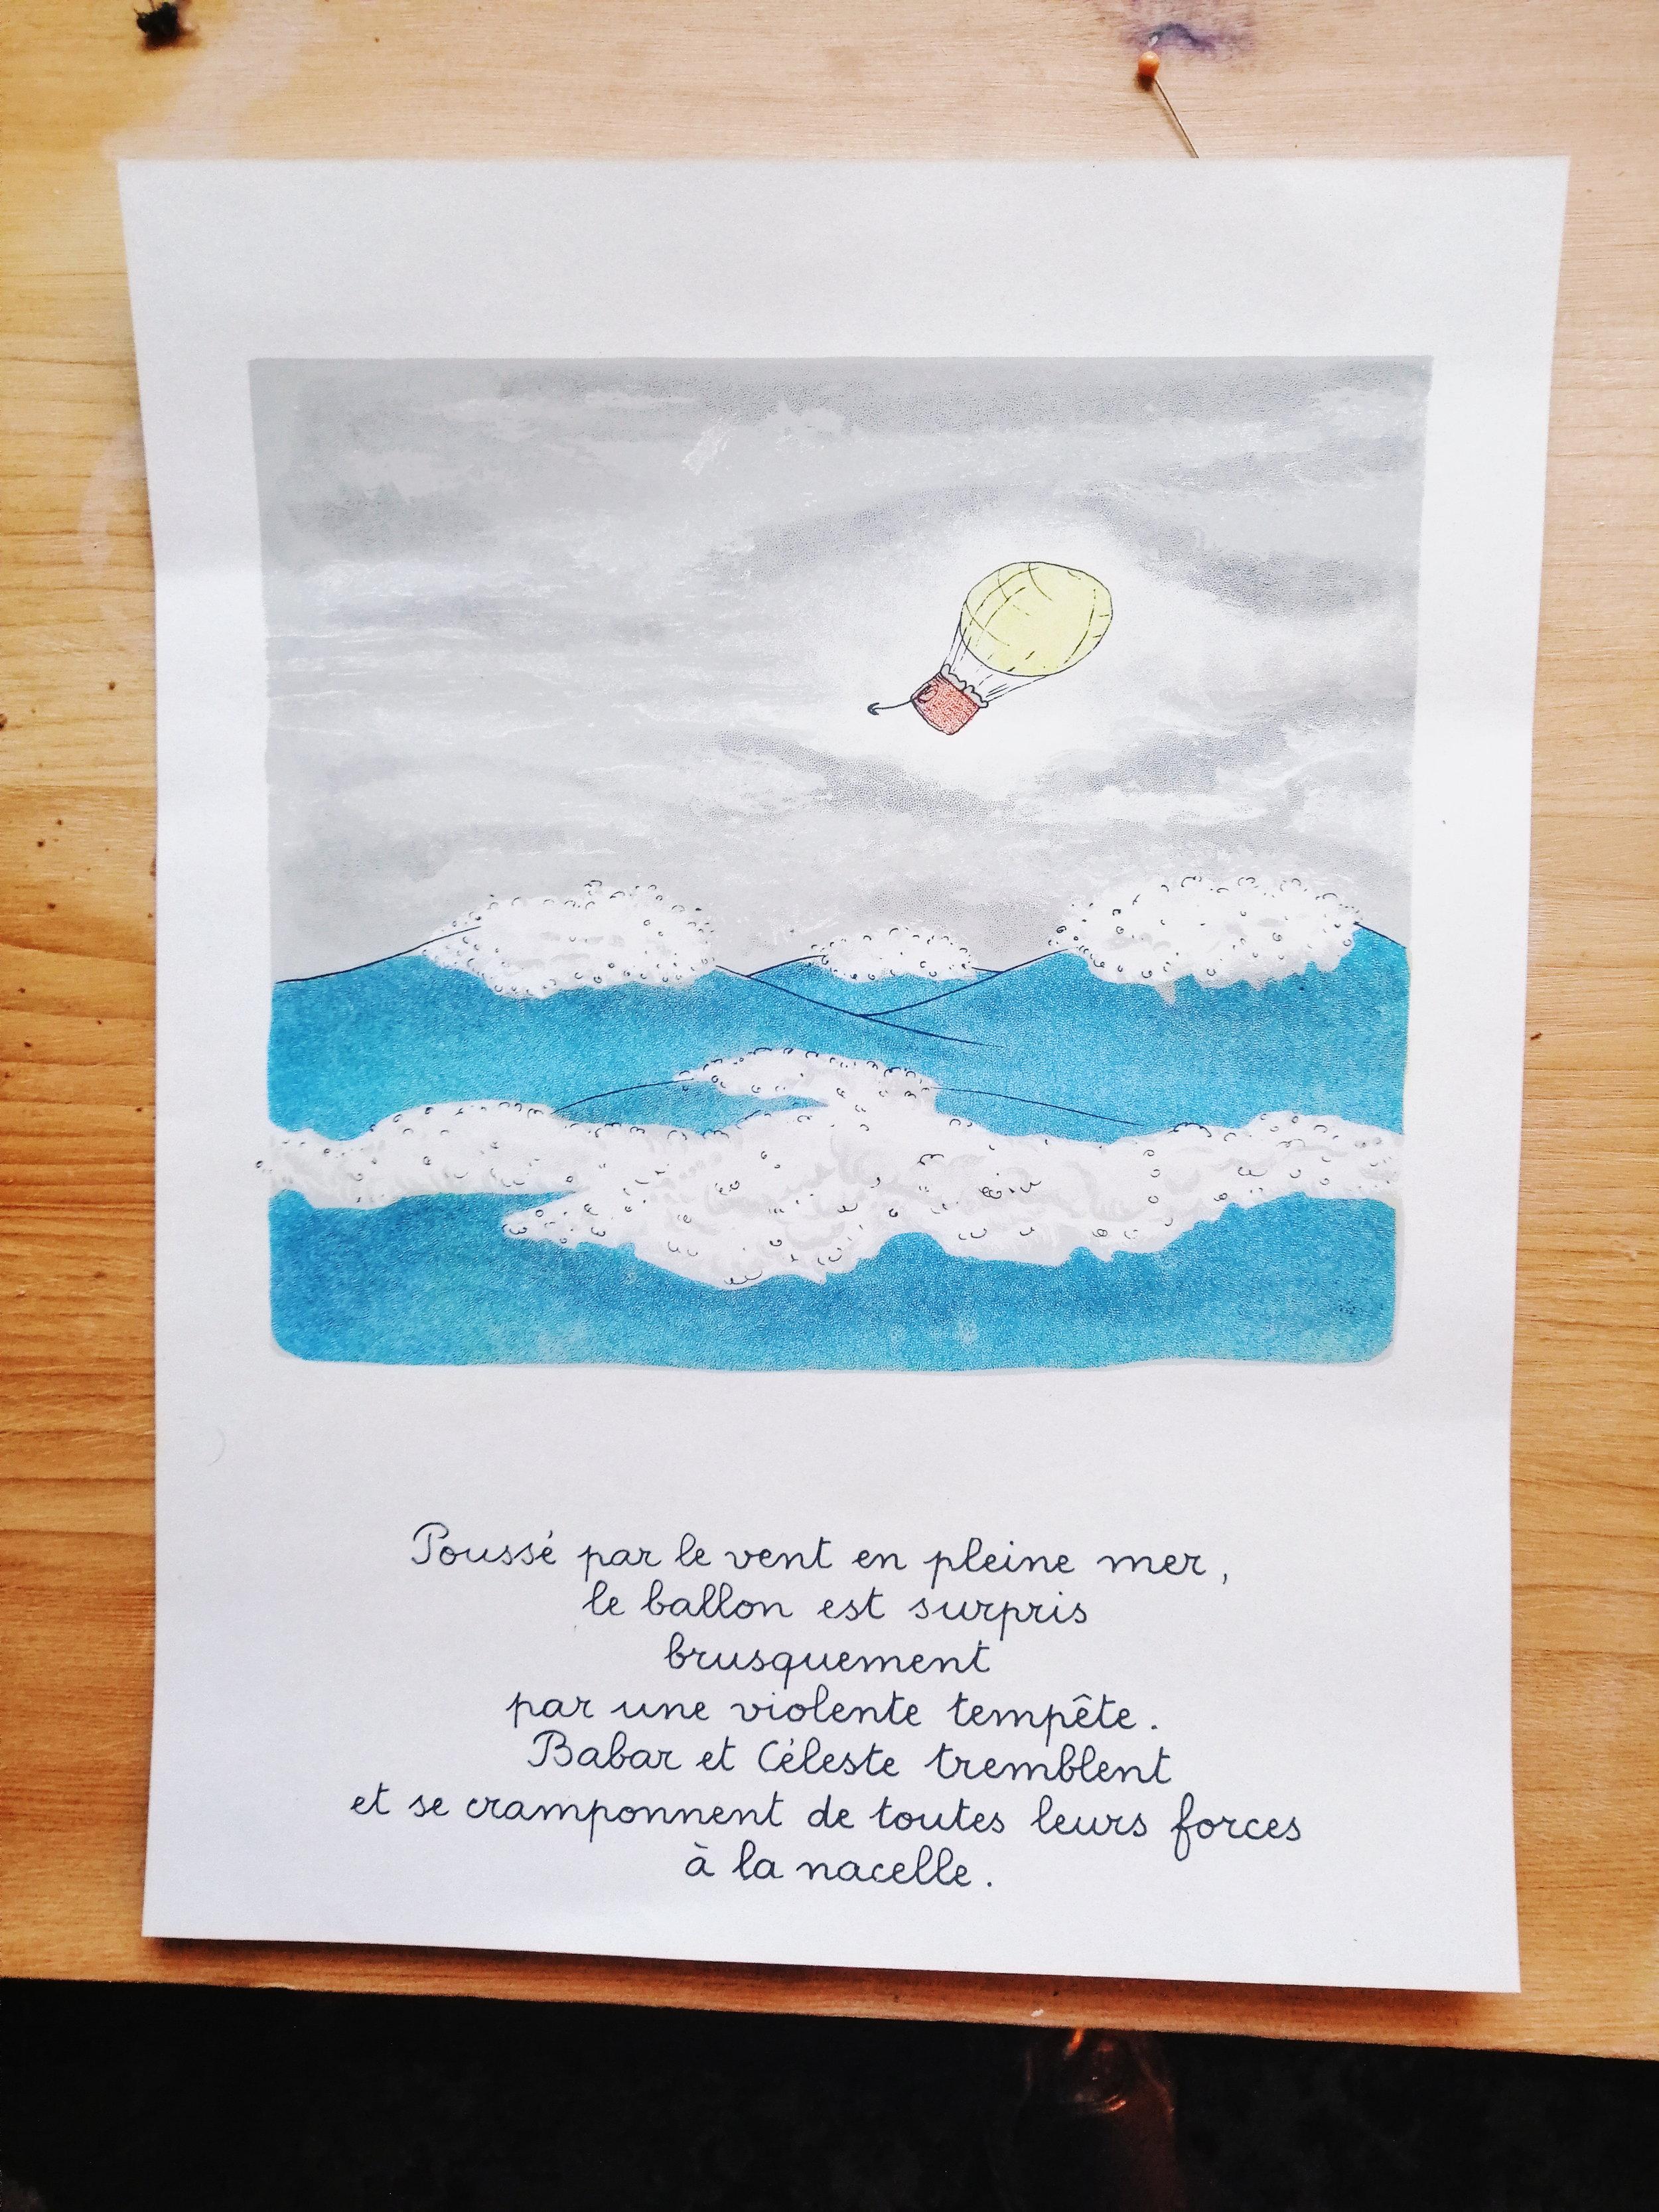 Hot air ballon french illustration.jpg